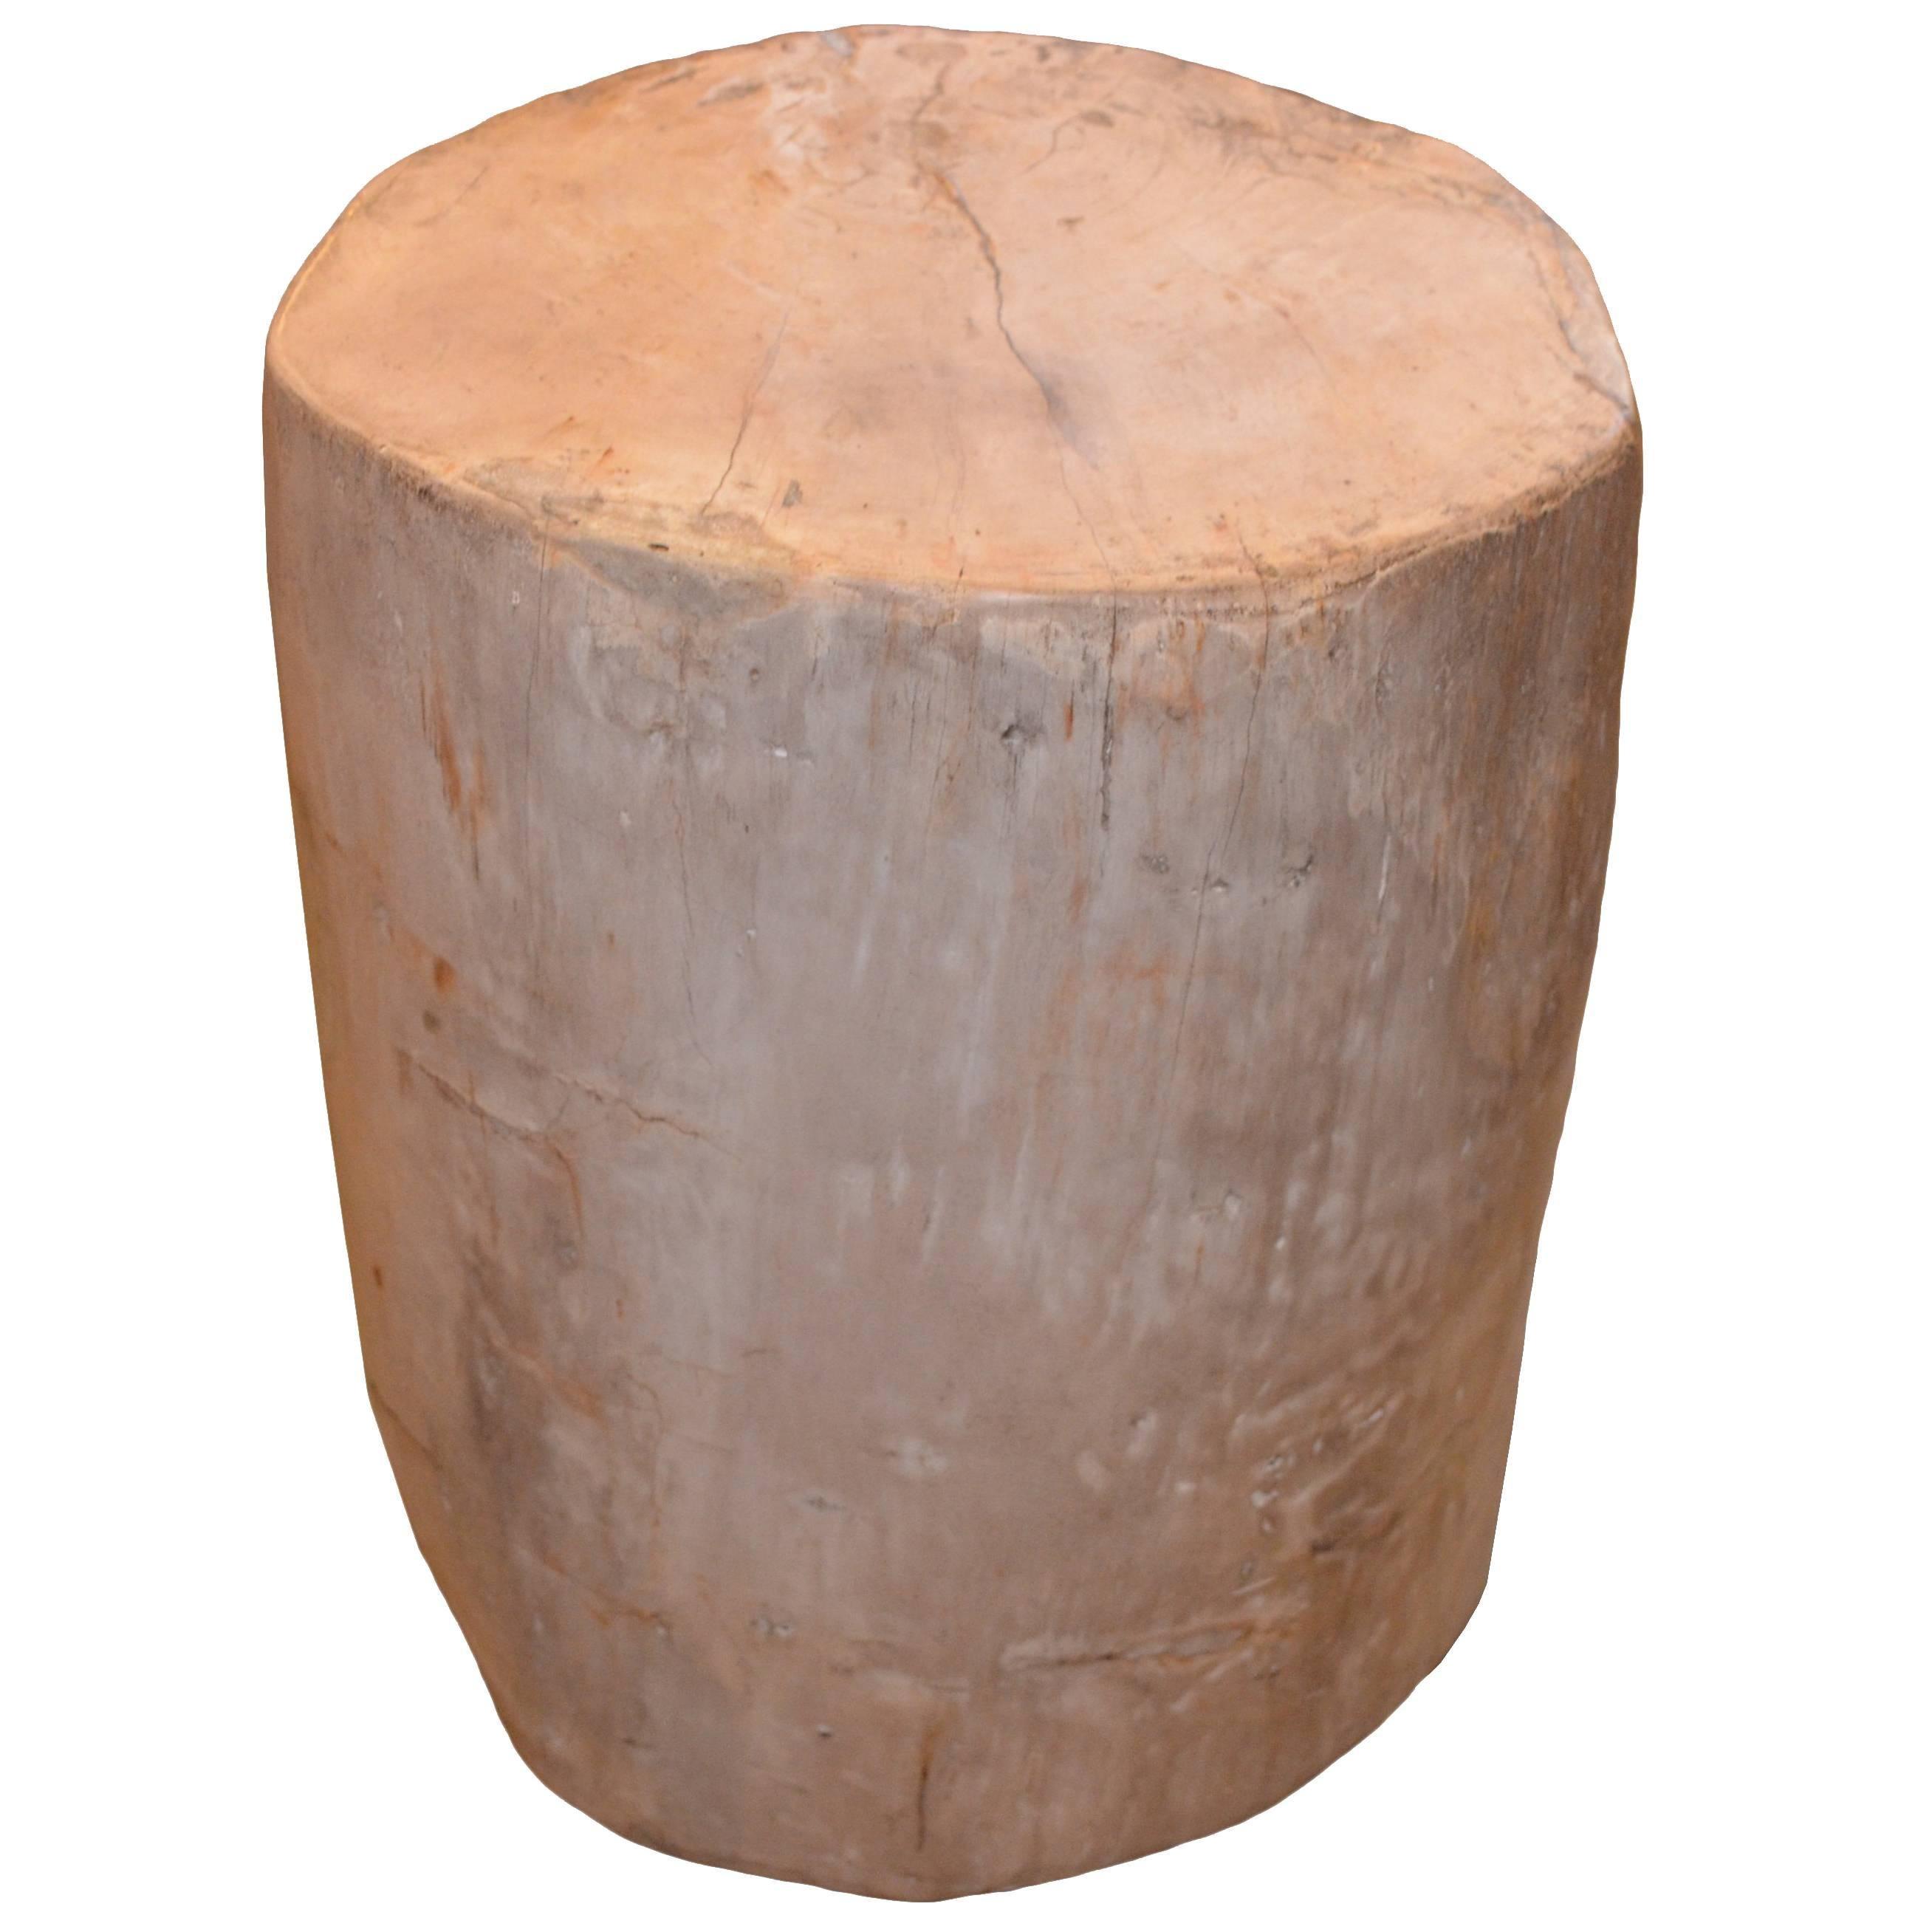 Petrified Wood Side Table Image Petrified Wood Side Table Gold